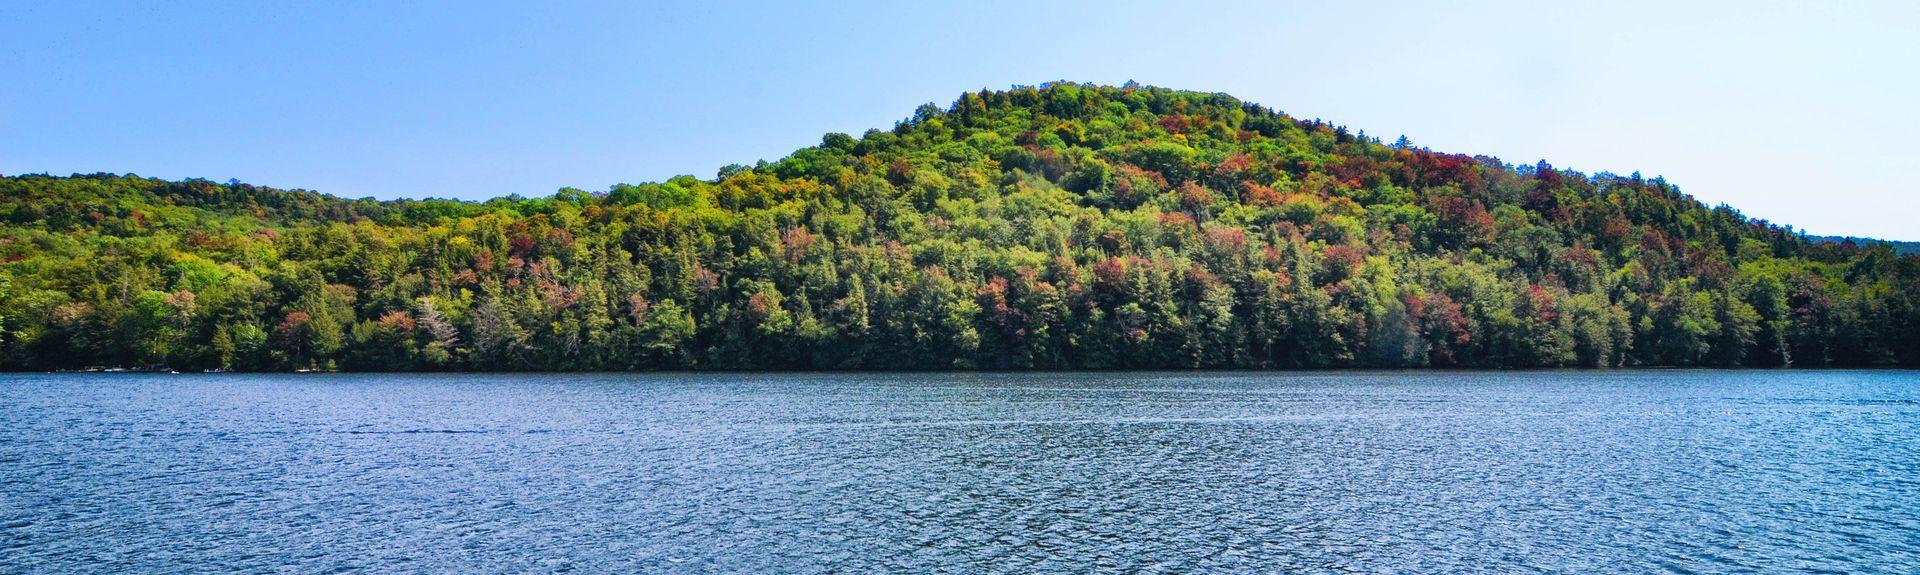 Caroga Lake, New York, United States of America